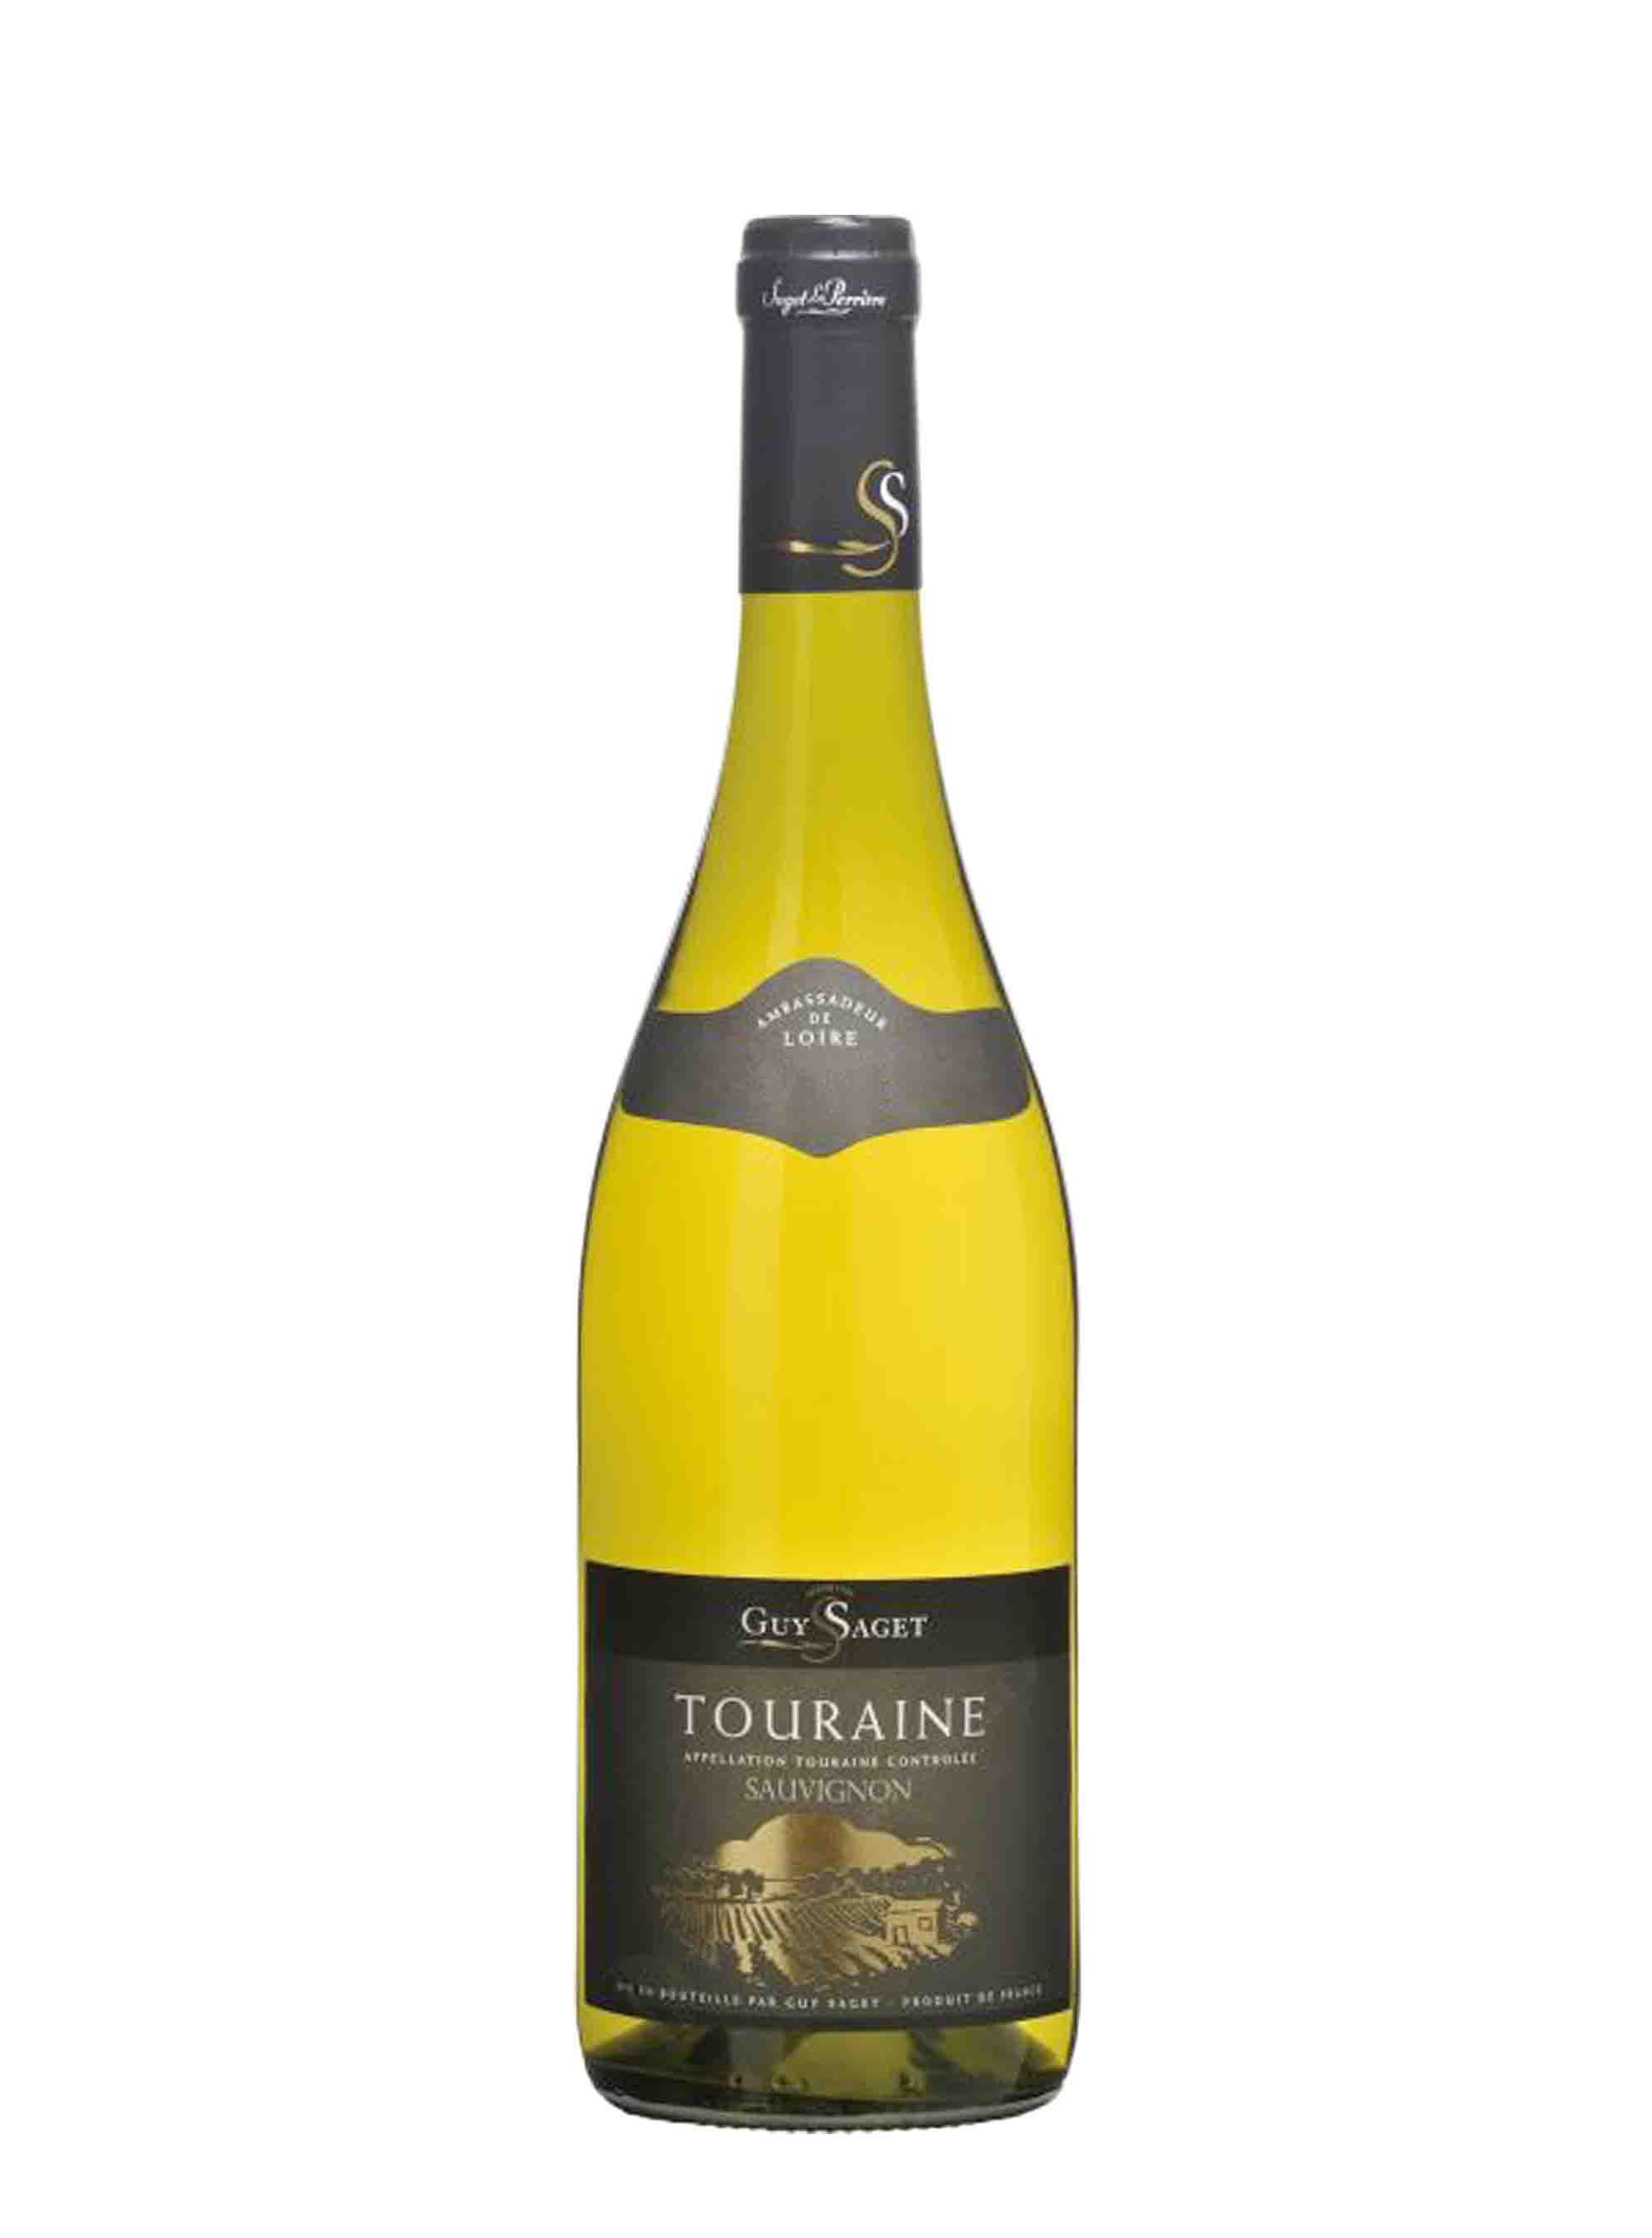 Sauvignon Blanc, AOC, 2014, Domaine Guy Saget, 0.75 l